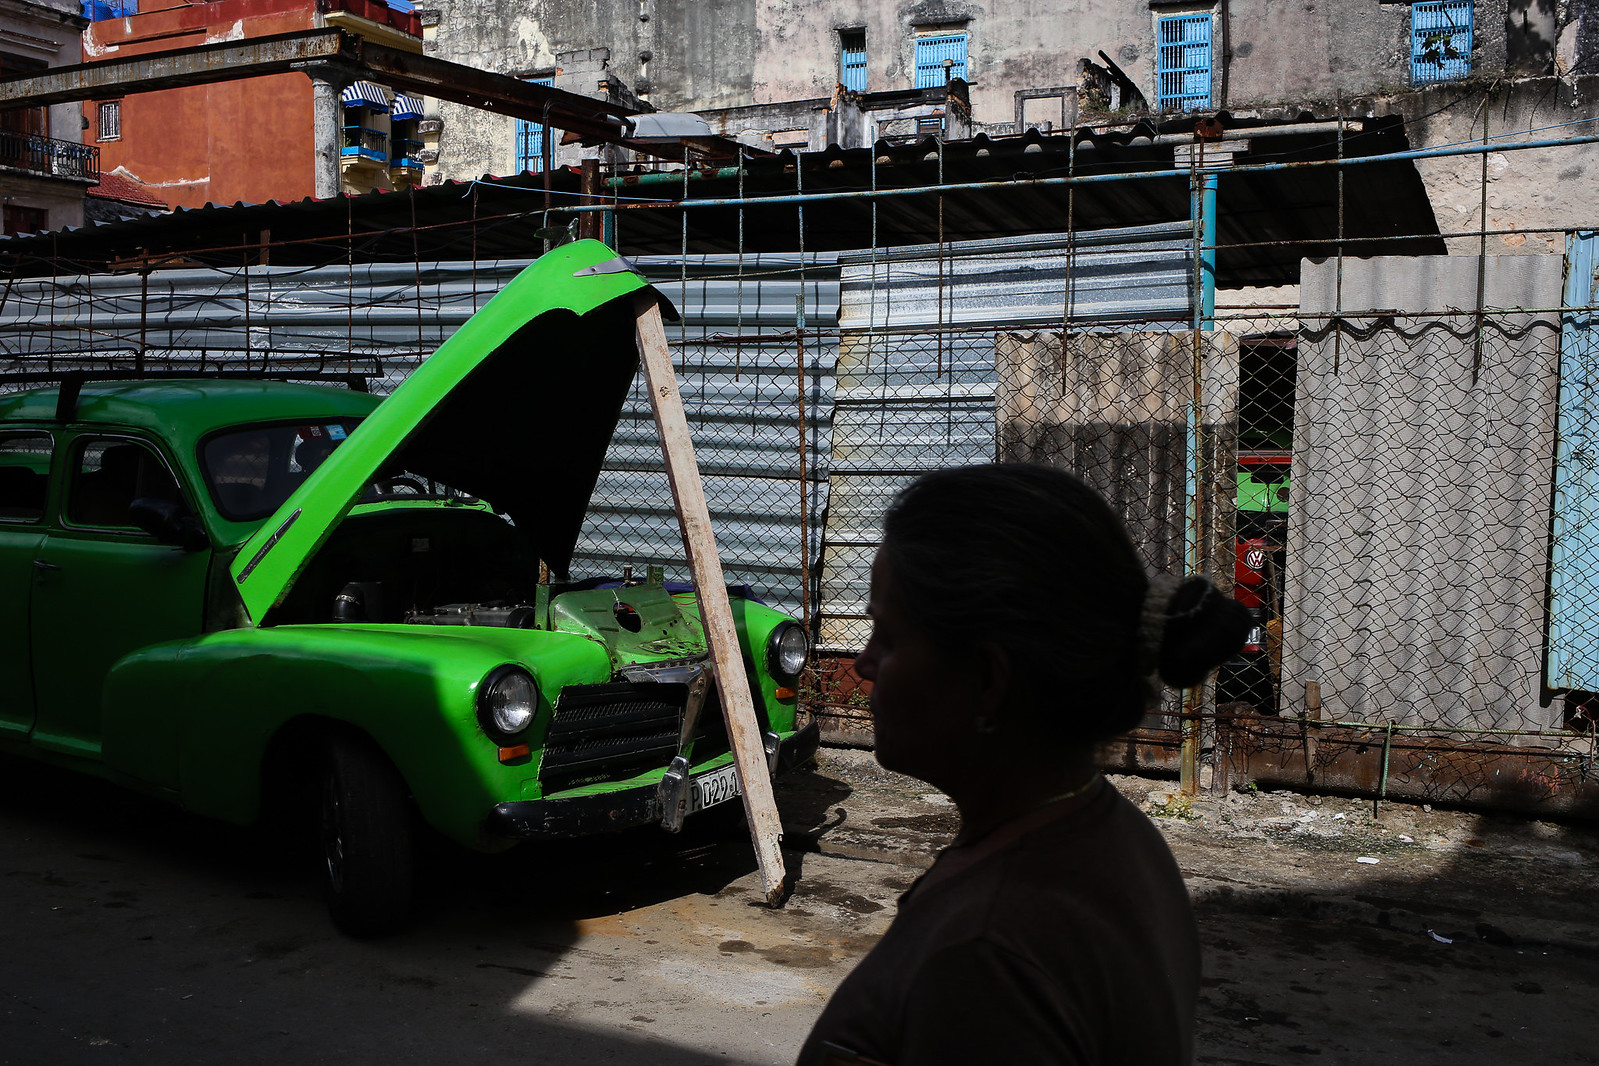 La Habana, Cuba | by jaumescar